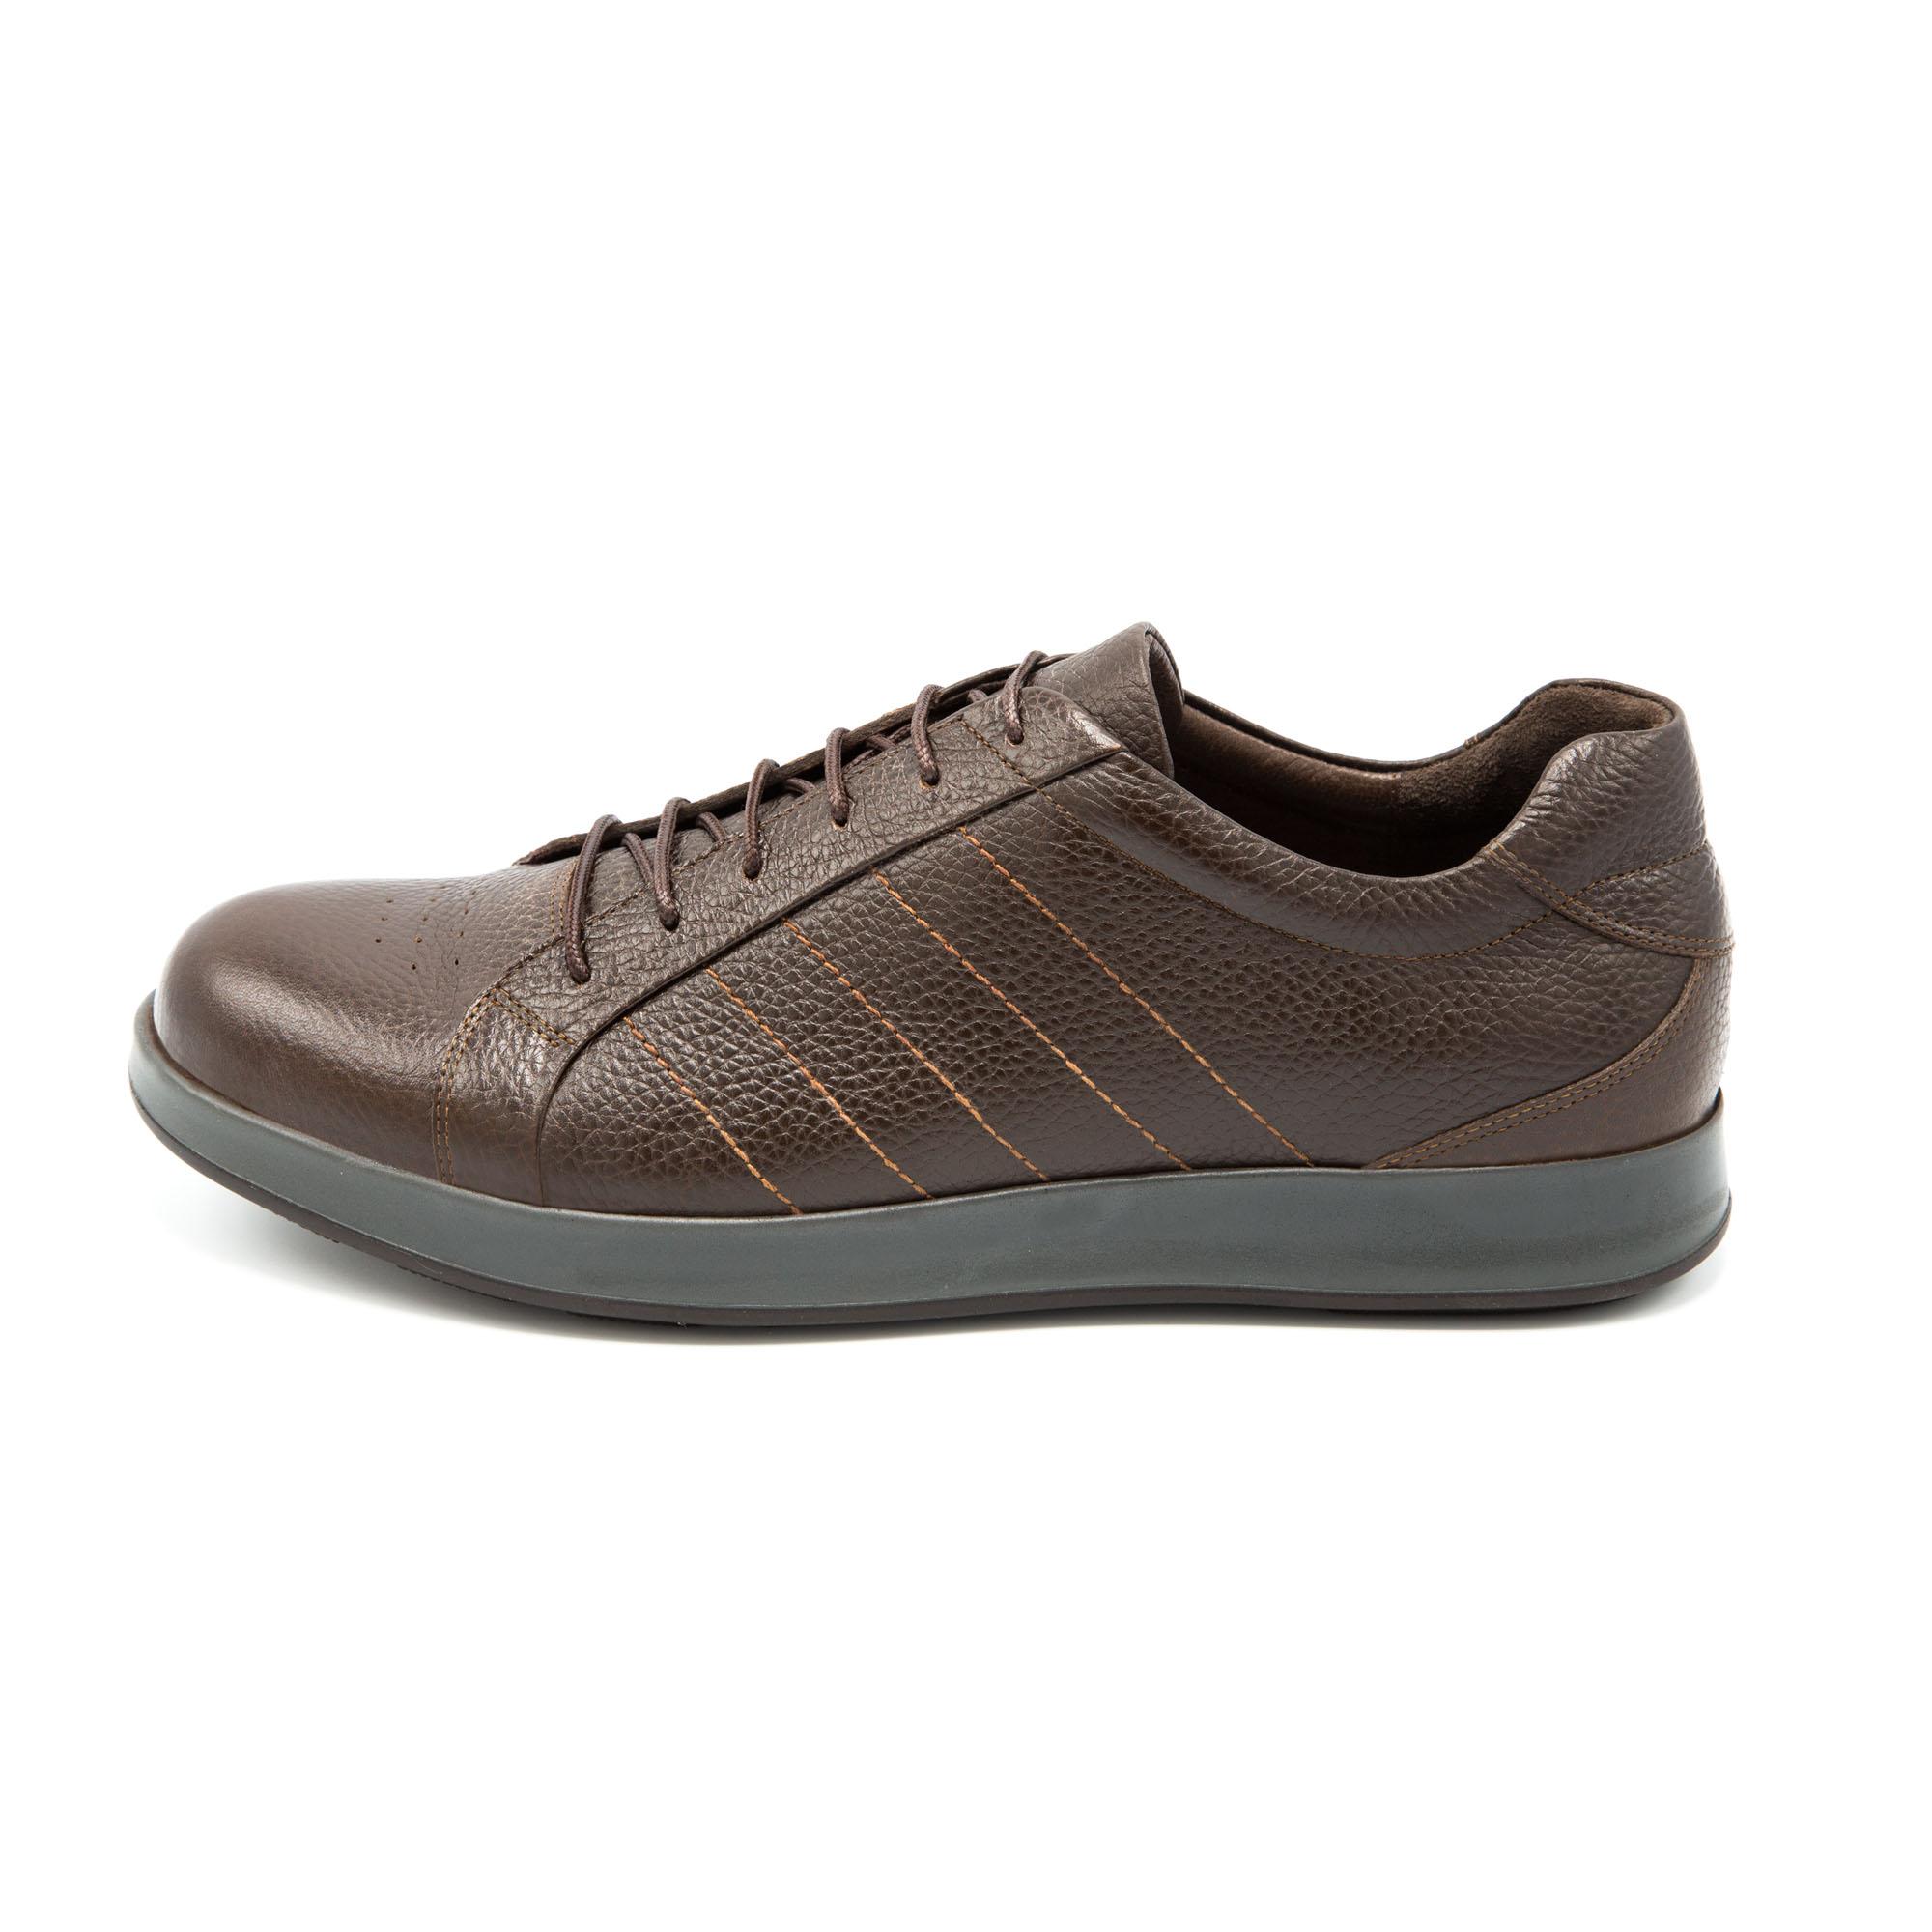 عکس کفش مردانه بهشتیان مدل یوونتوس کد89520